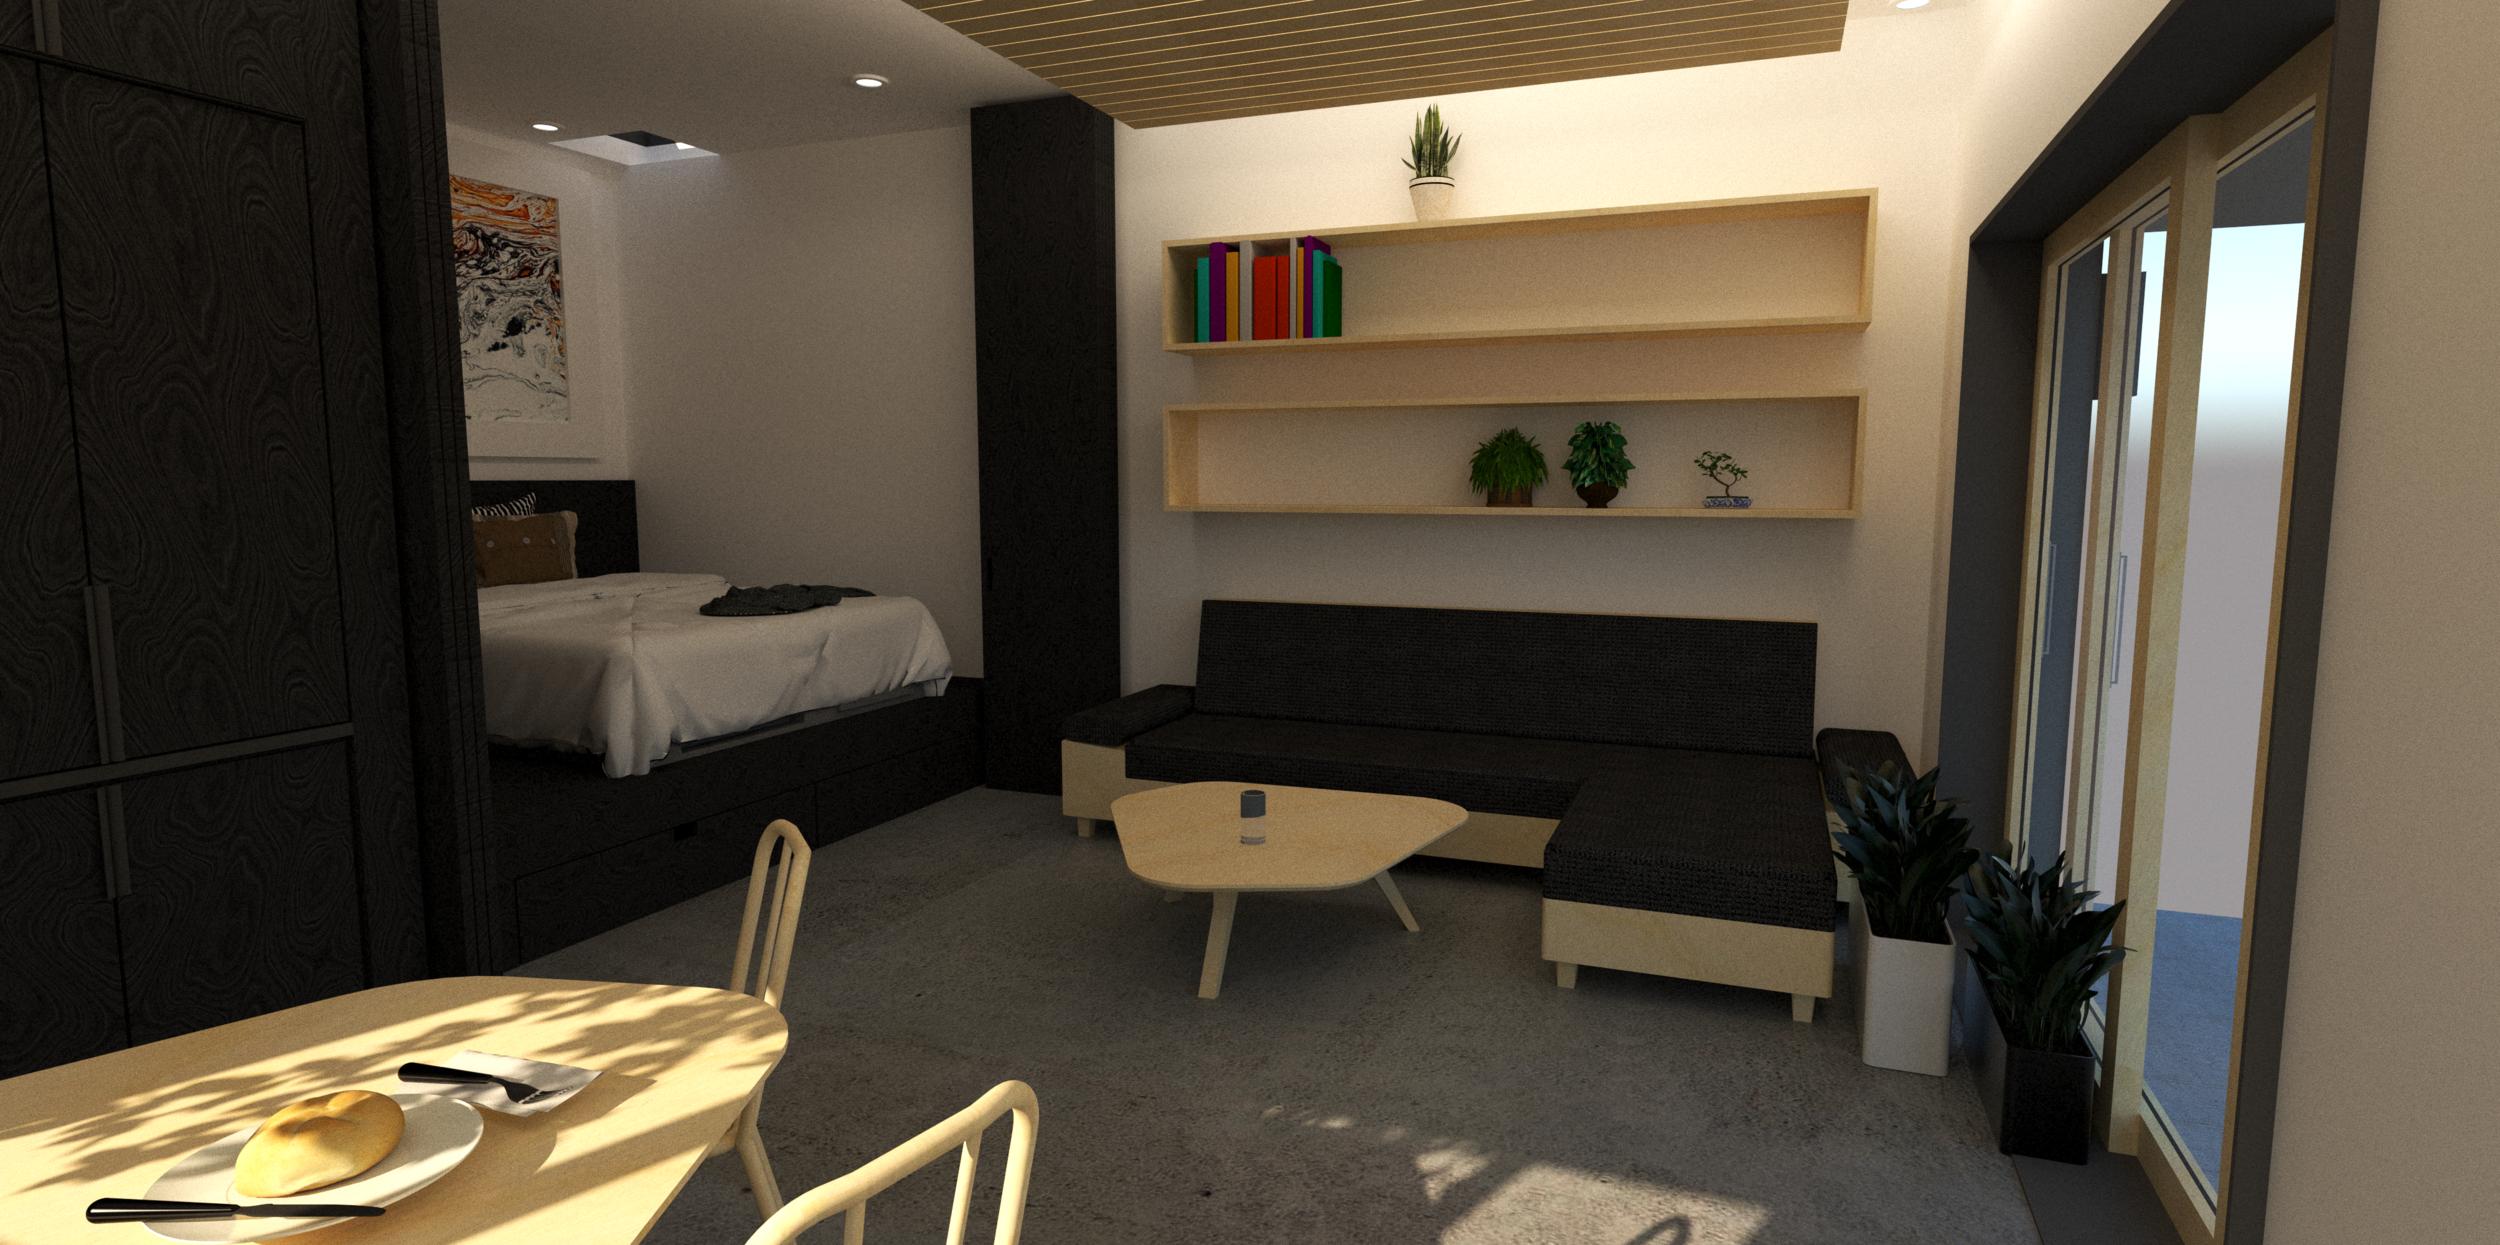 DADU interior 4.png